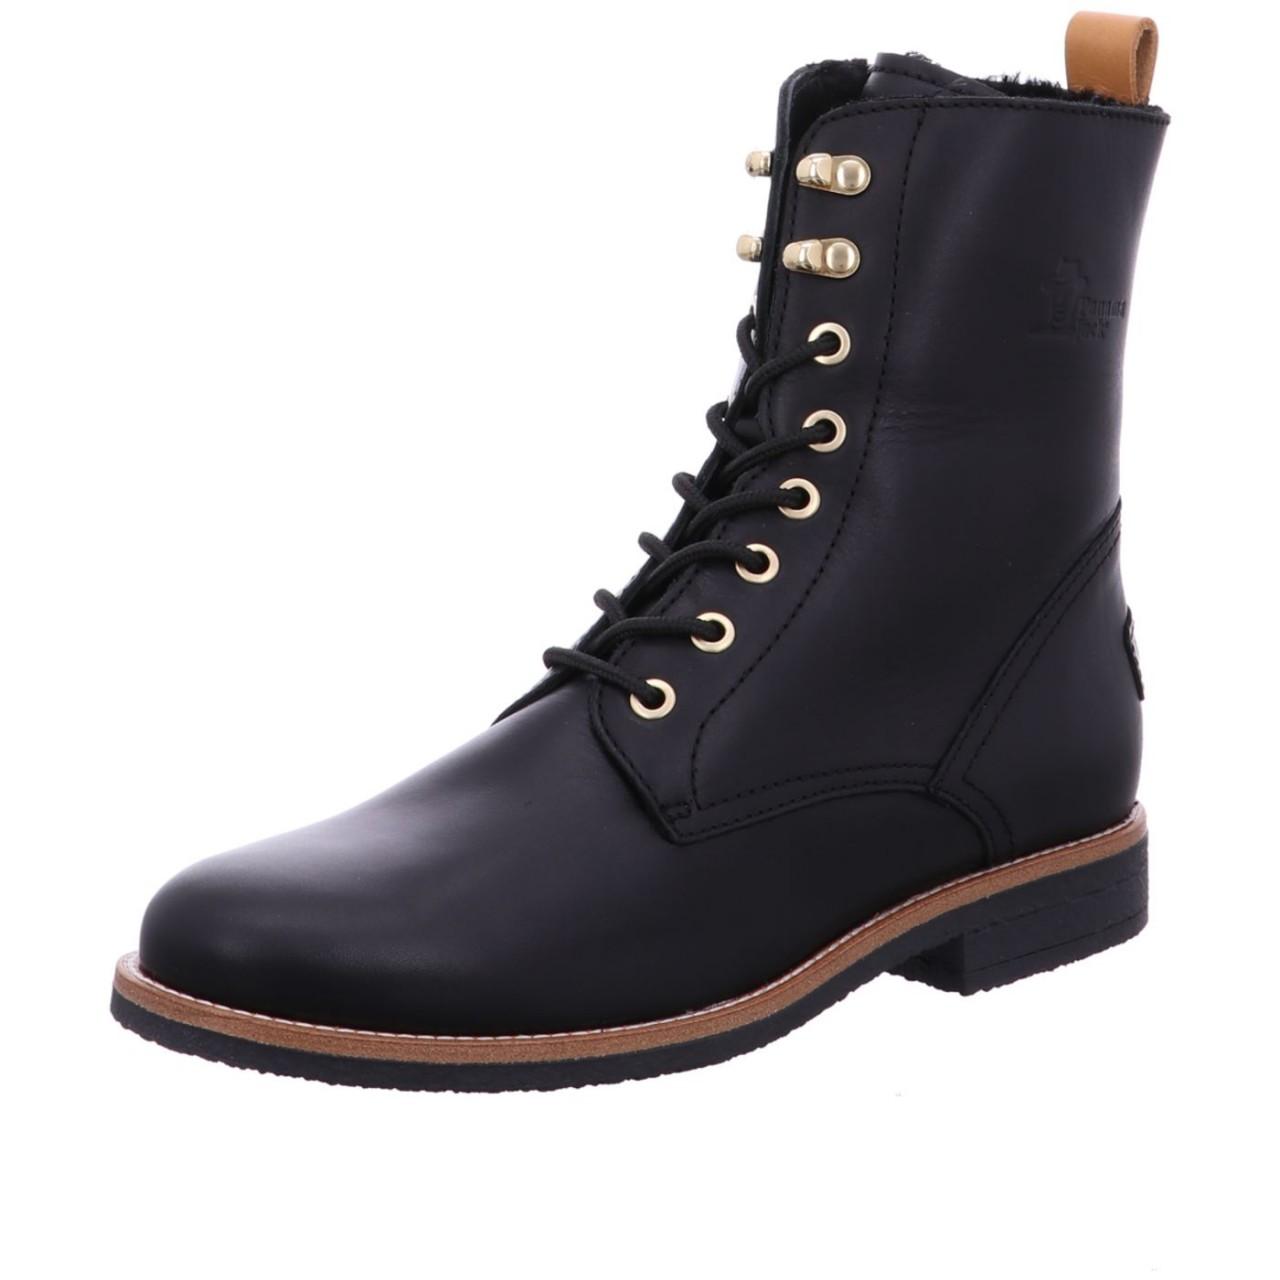 Panama Jack Boot Gatha Igloo Travelling B1 Schwarz Gatha Igloo Trav B1 black